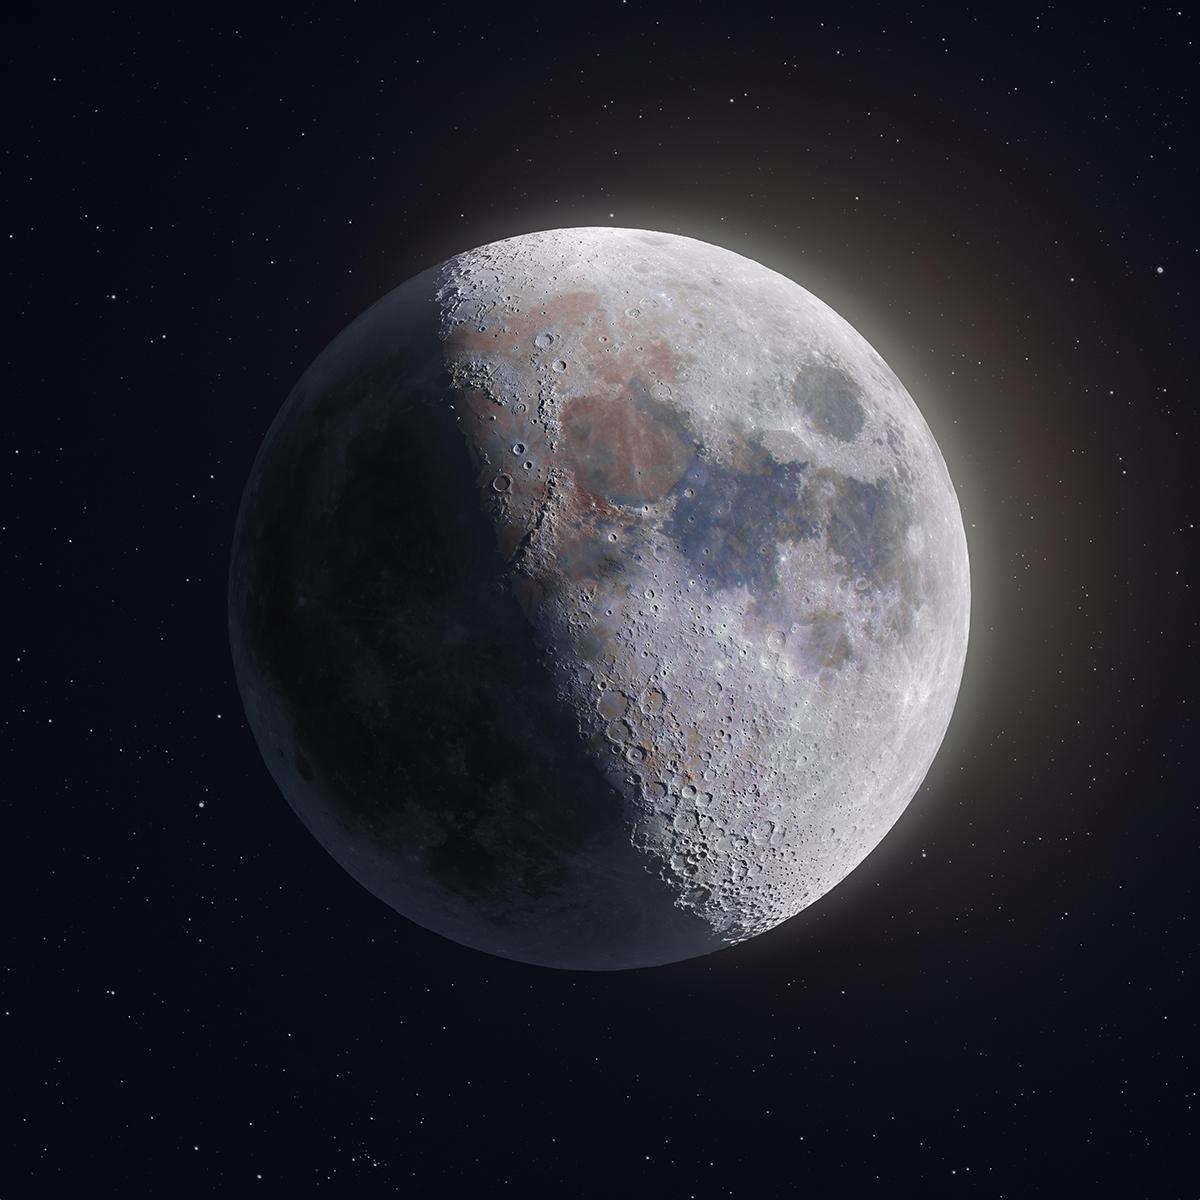 Andrew McCarthy 209 Megapixel Moon Image Astro Photography